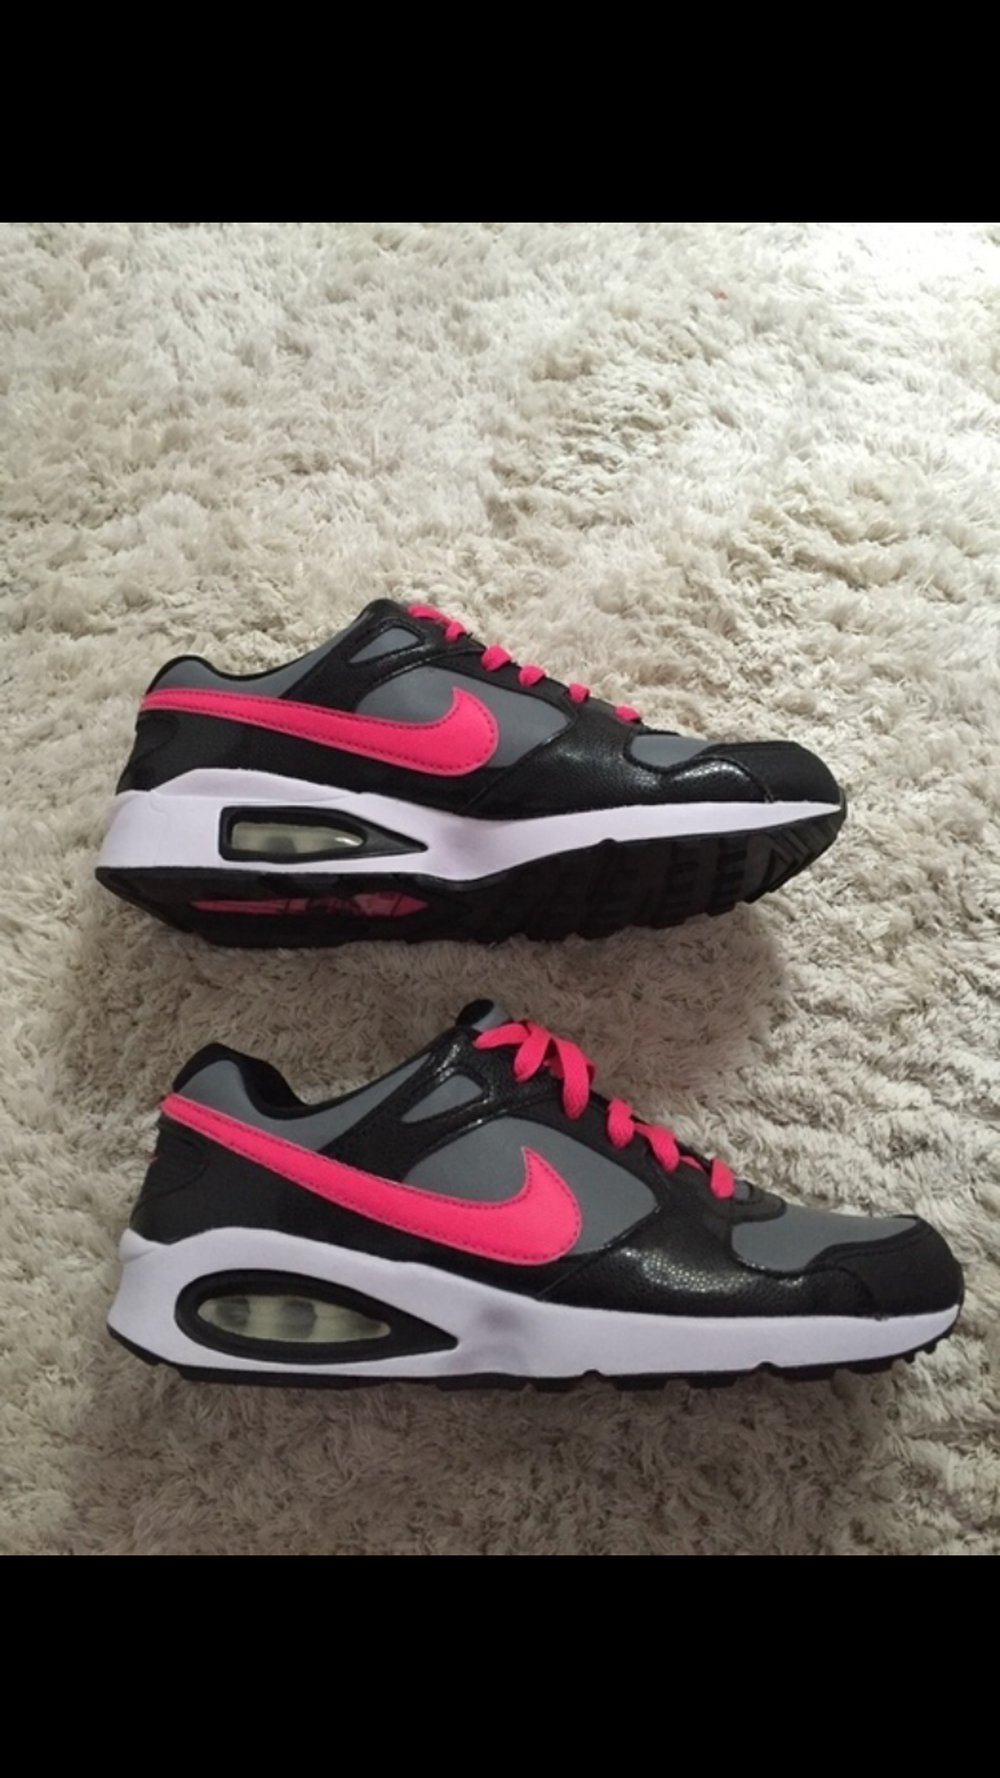 Nike Air Max Schwarz Pink Gr. 38,5